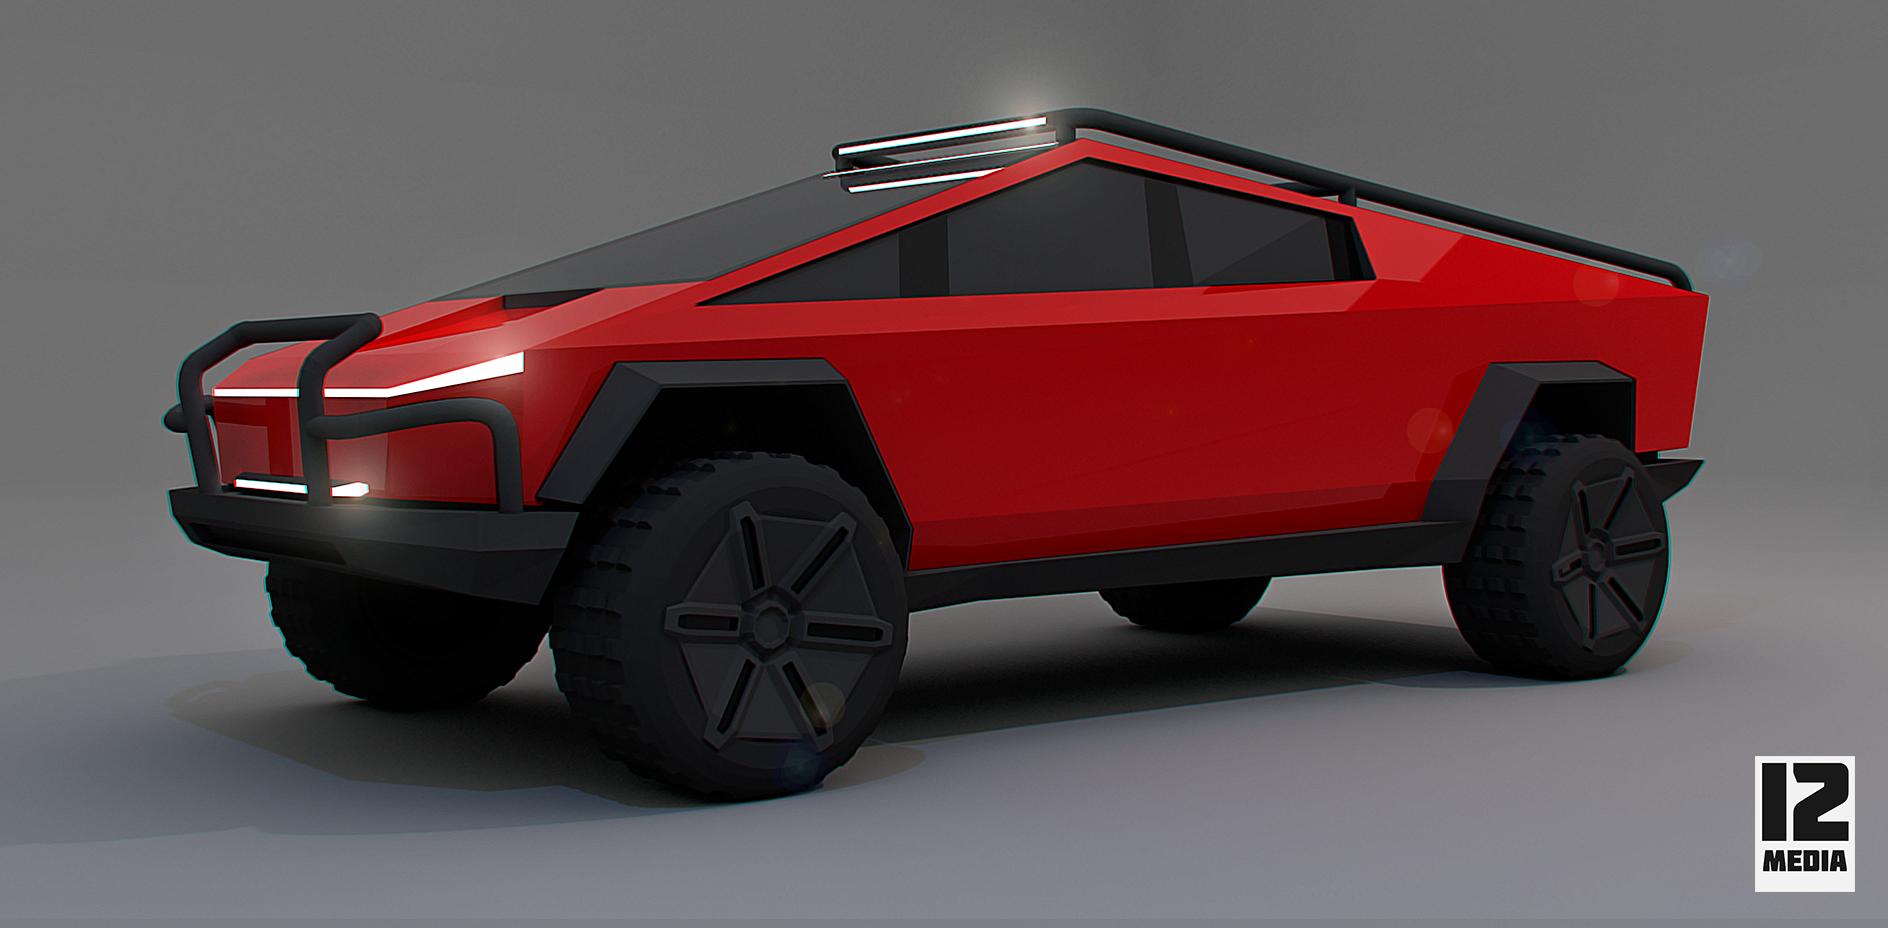 Modded Cybertruck Tesla Car Futuristic Cars Tesla Motors